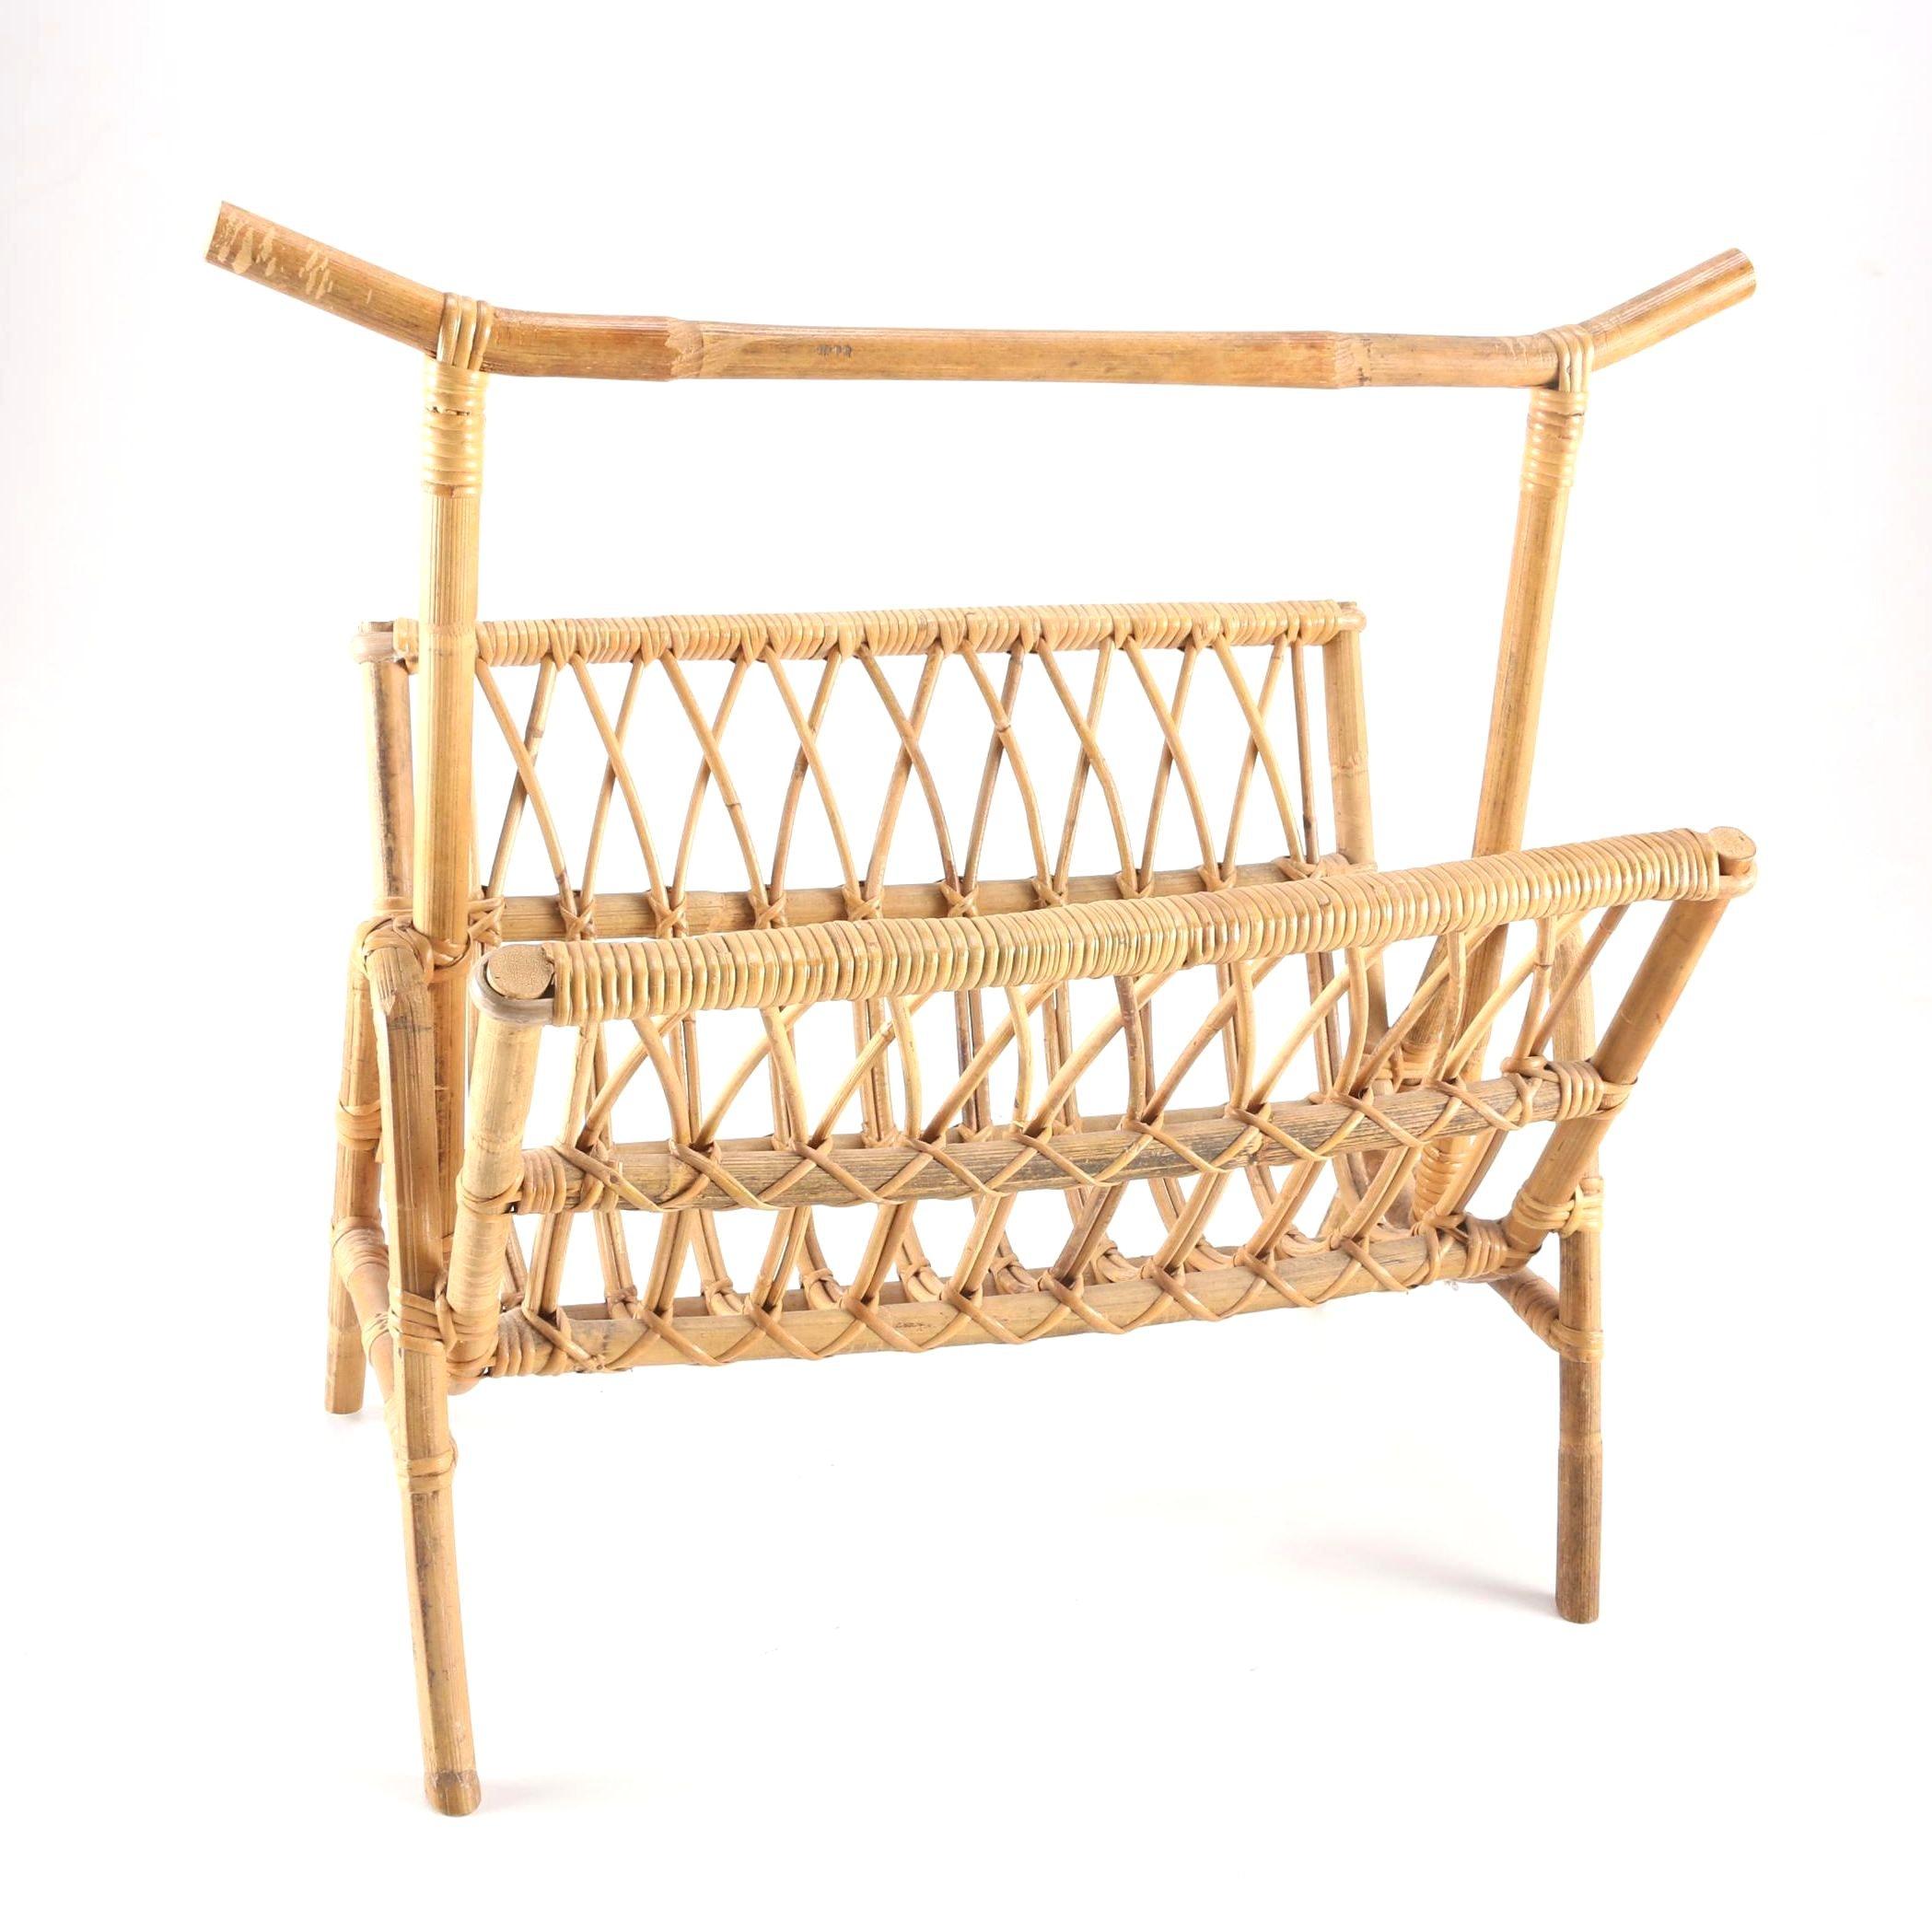 How to make a bamboo magazine rack